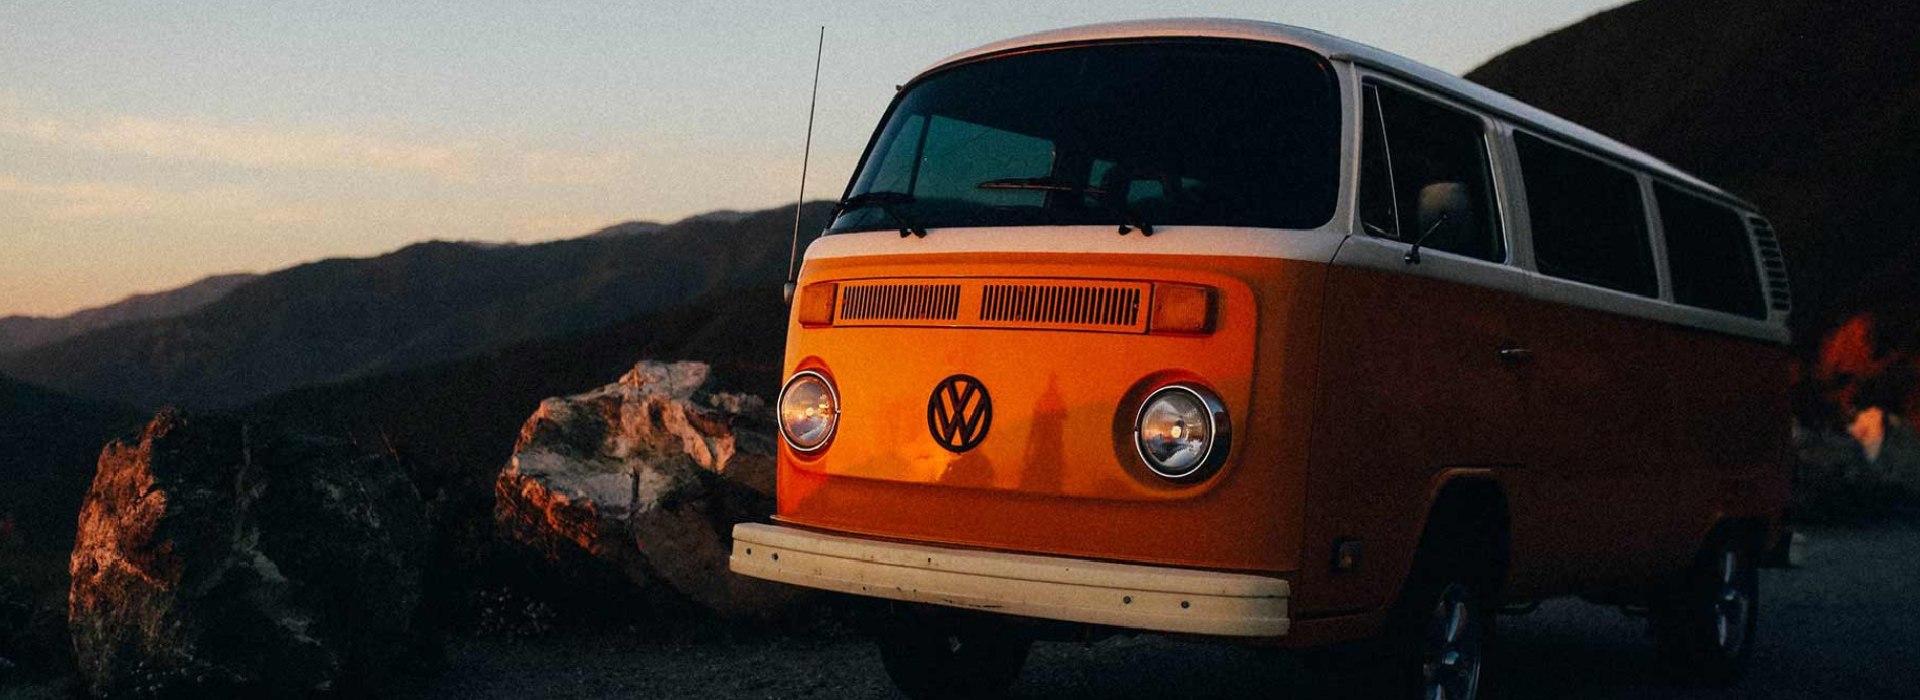 Holidays with Family  New Travel Ideas